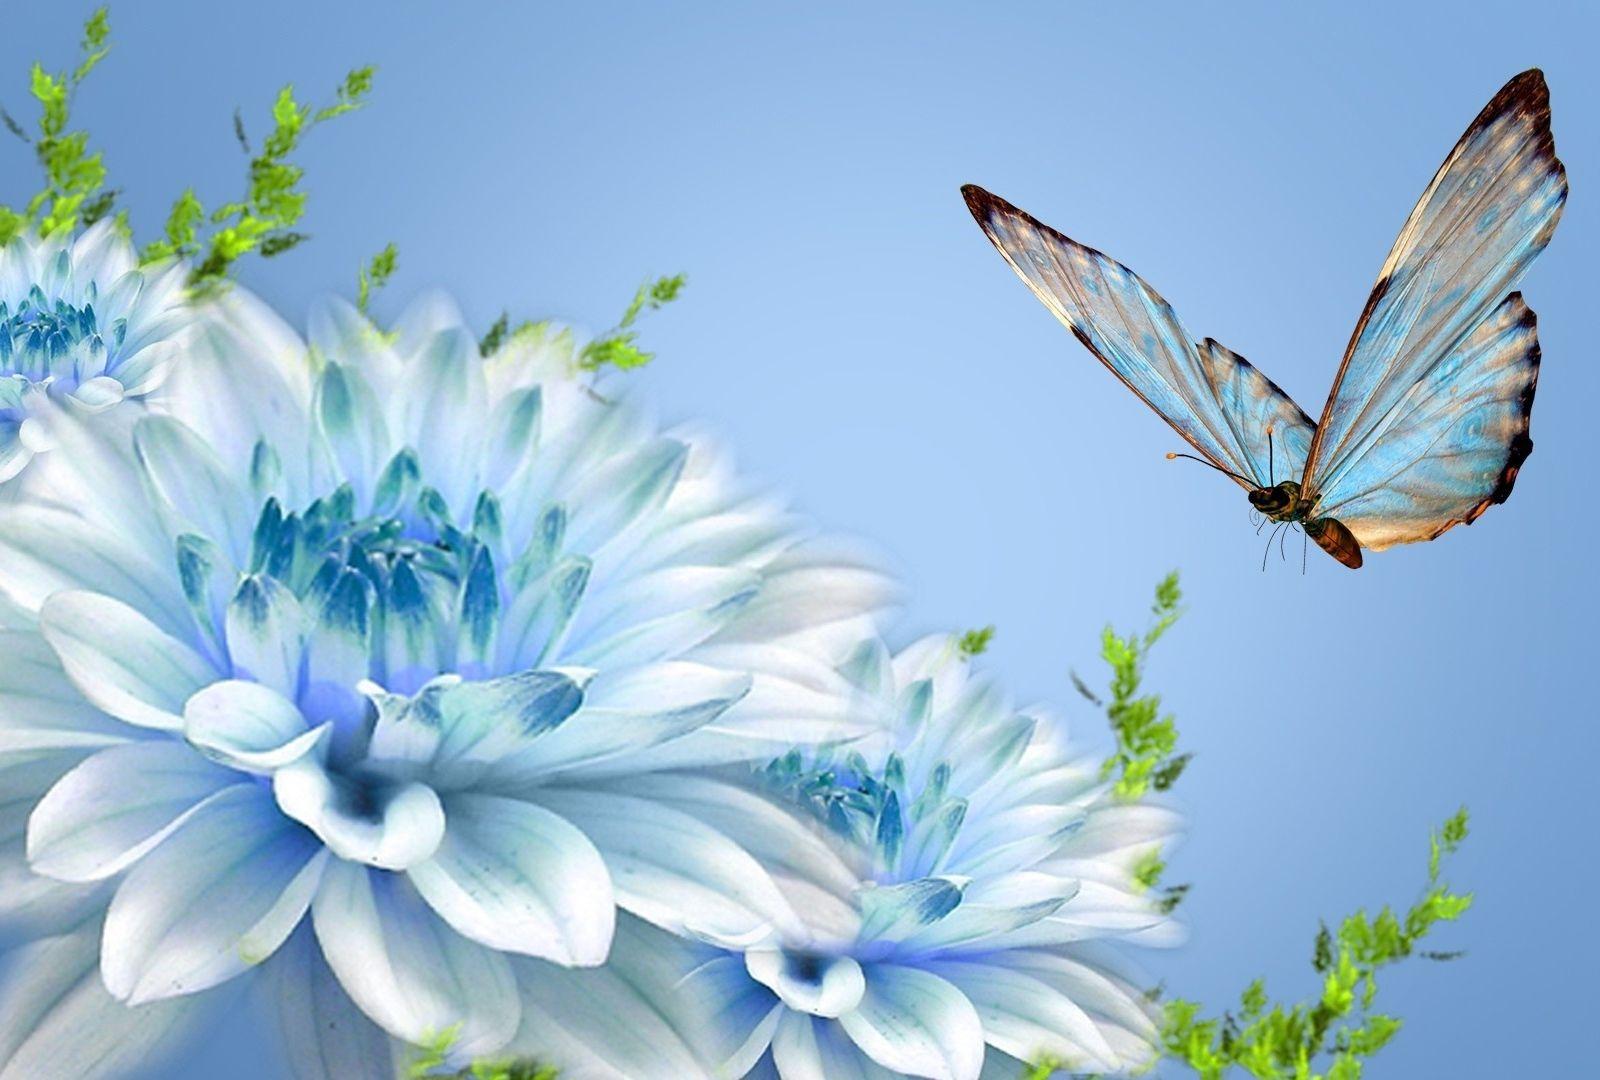 Popular Wallpaper Butterfly Spring - 58db96fa42e1a9d6ccb37affd9d841fc  Graphic_533432.jpg